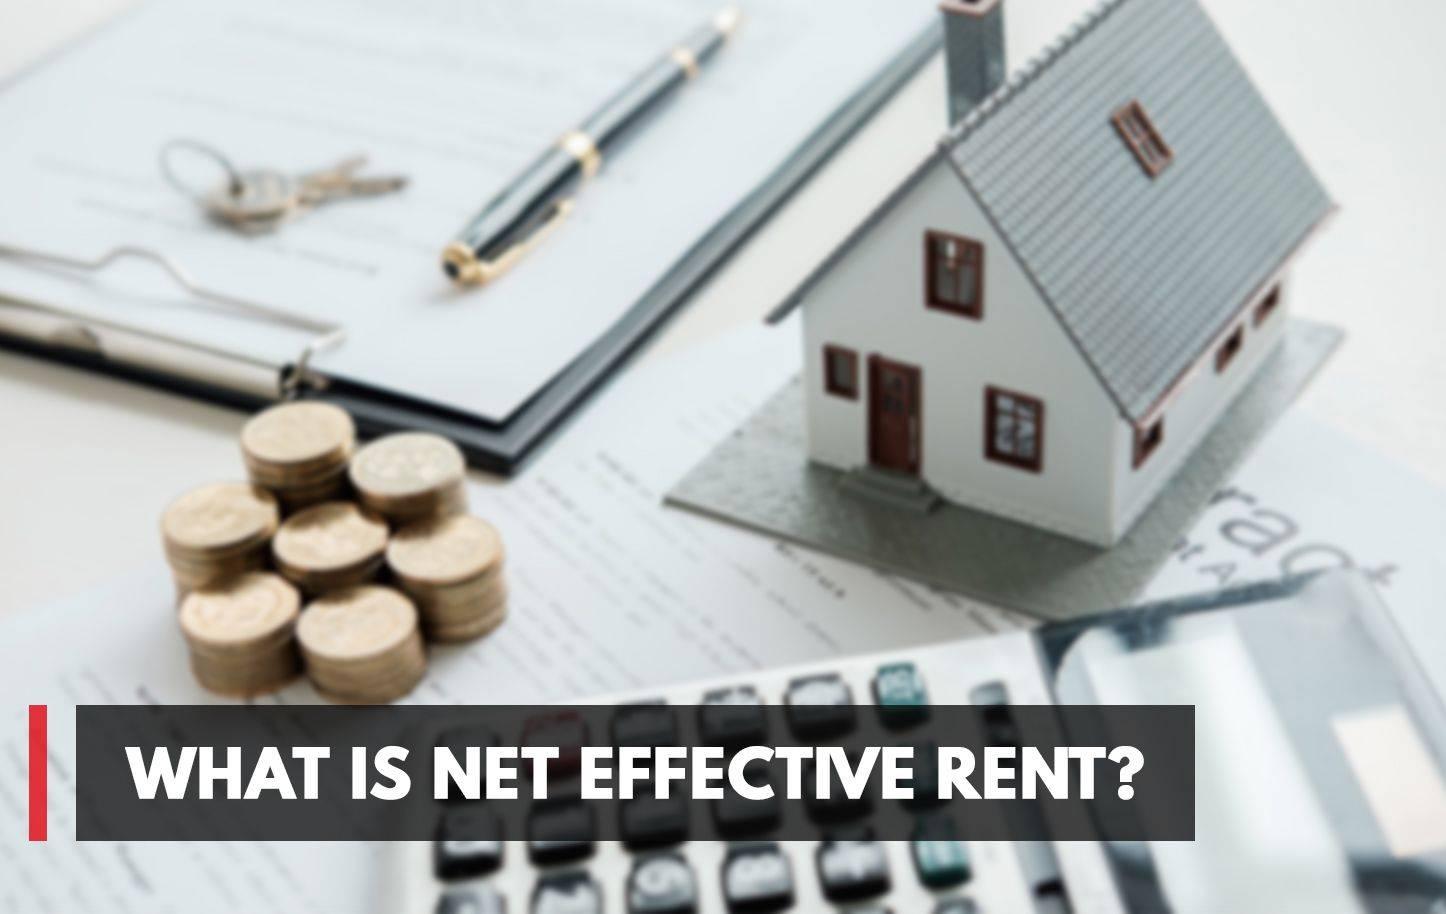 What Is Net Effective Rent?